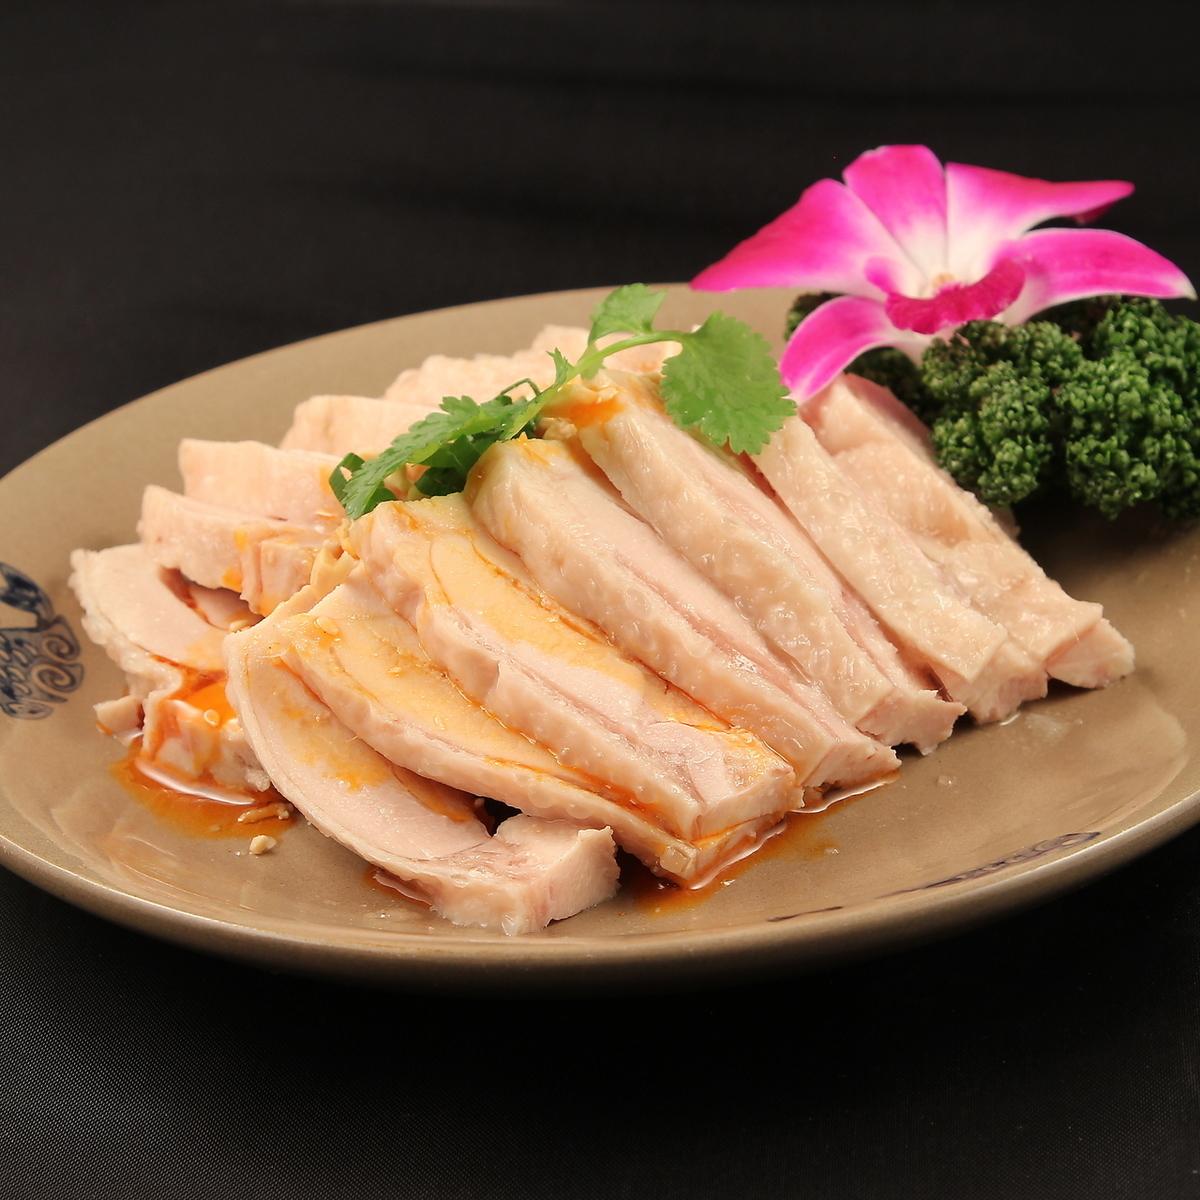 Tasty sauce chicken special sauce (Chongqing) / Bang bangie (Chengdu)